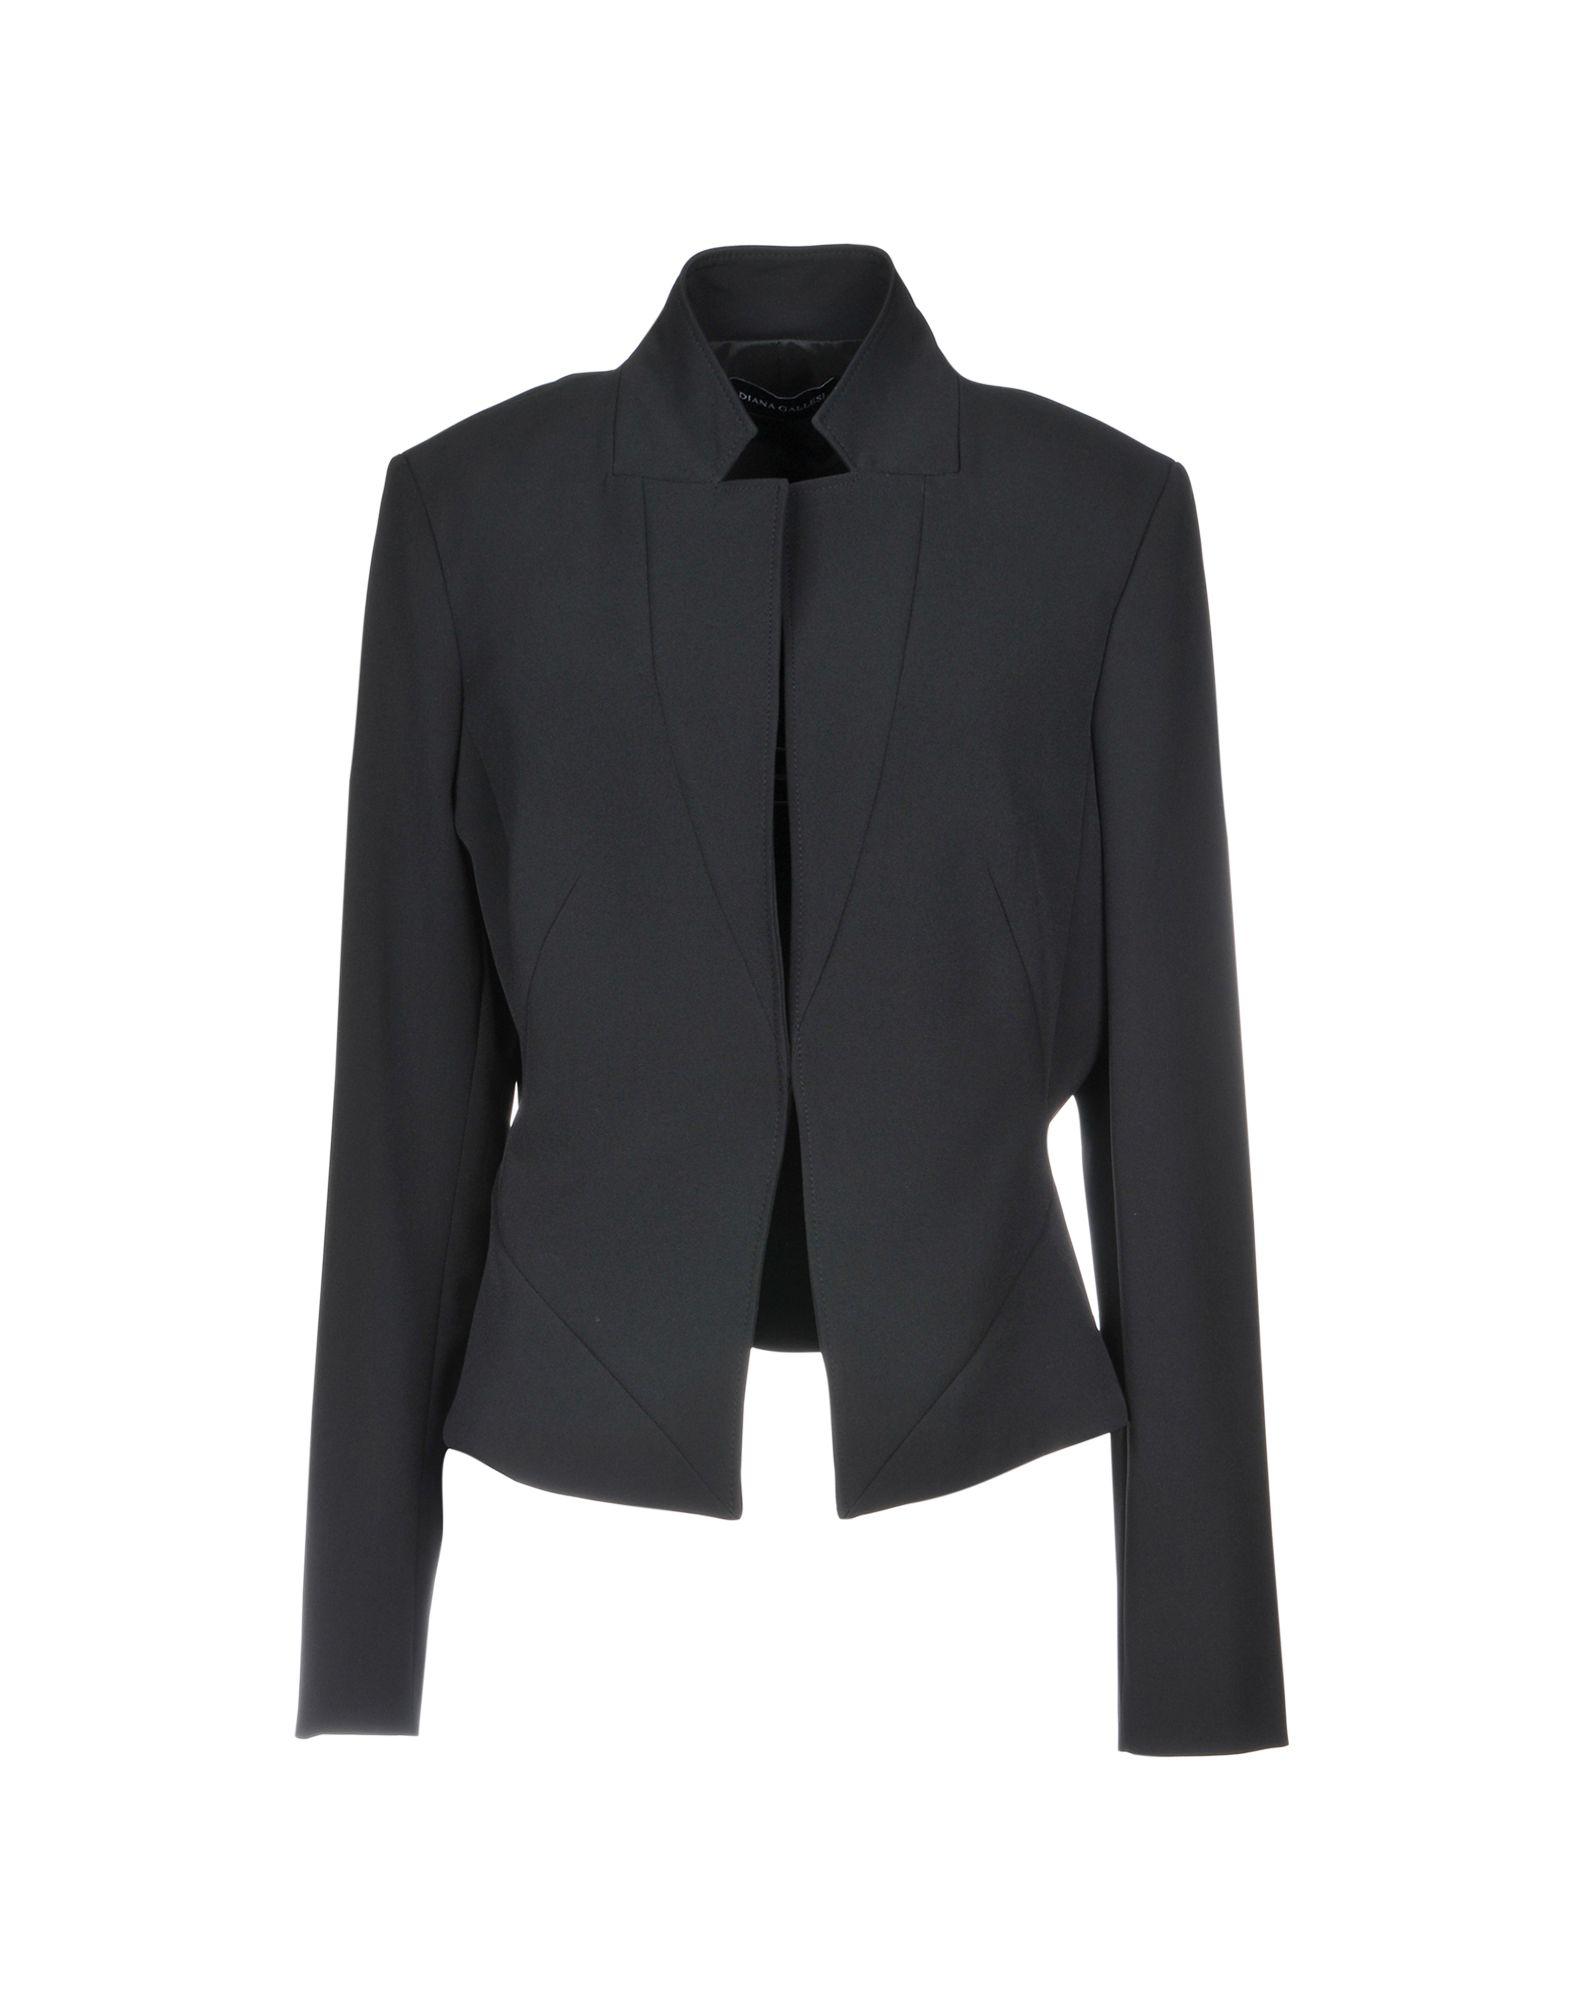 DIANA GALLESI Пиджак пиджак diana gallesi одежда свободного кроя